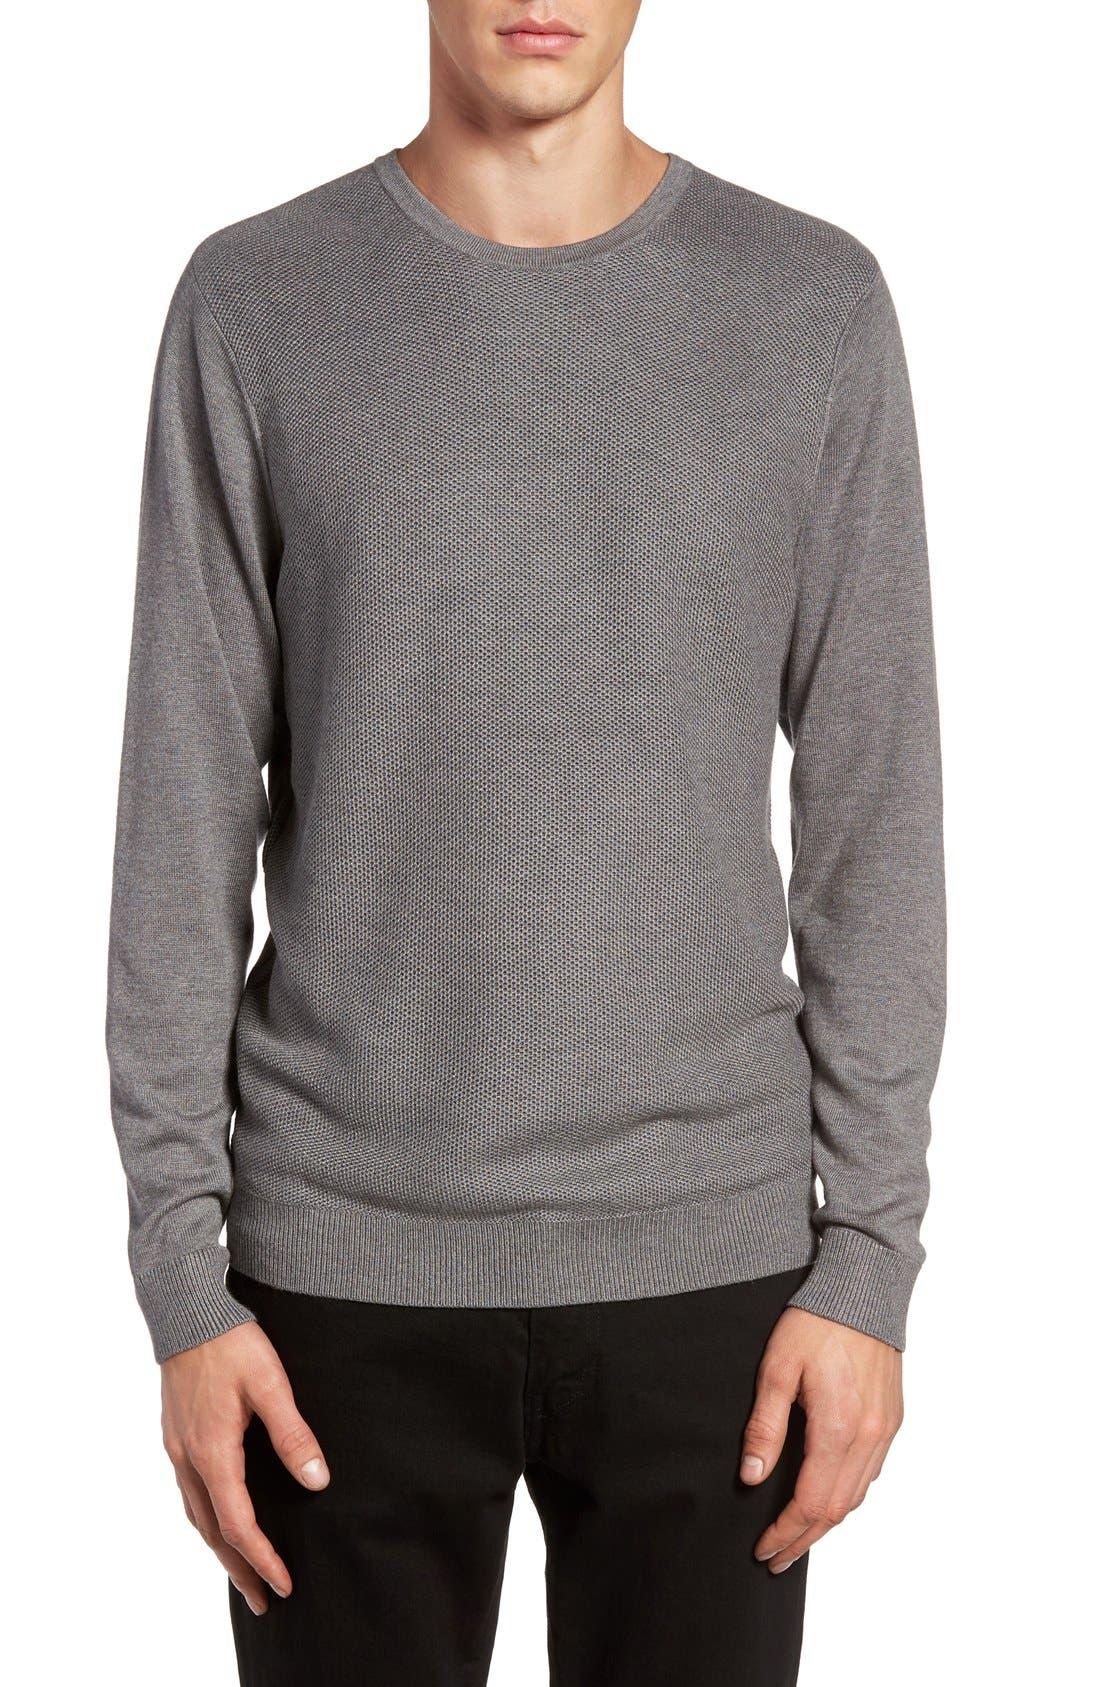 Main Image - Calibrate Honeycomb Stitch Crewneck Sweater